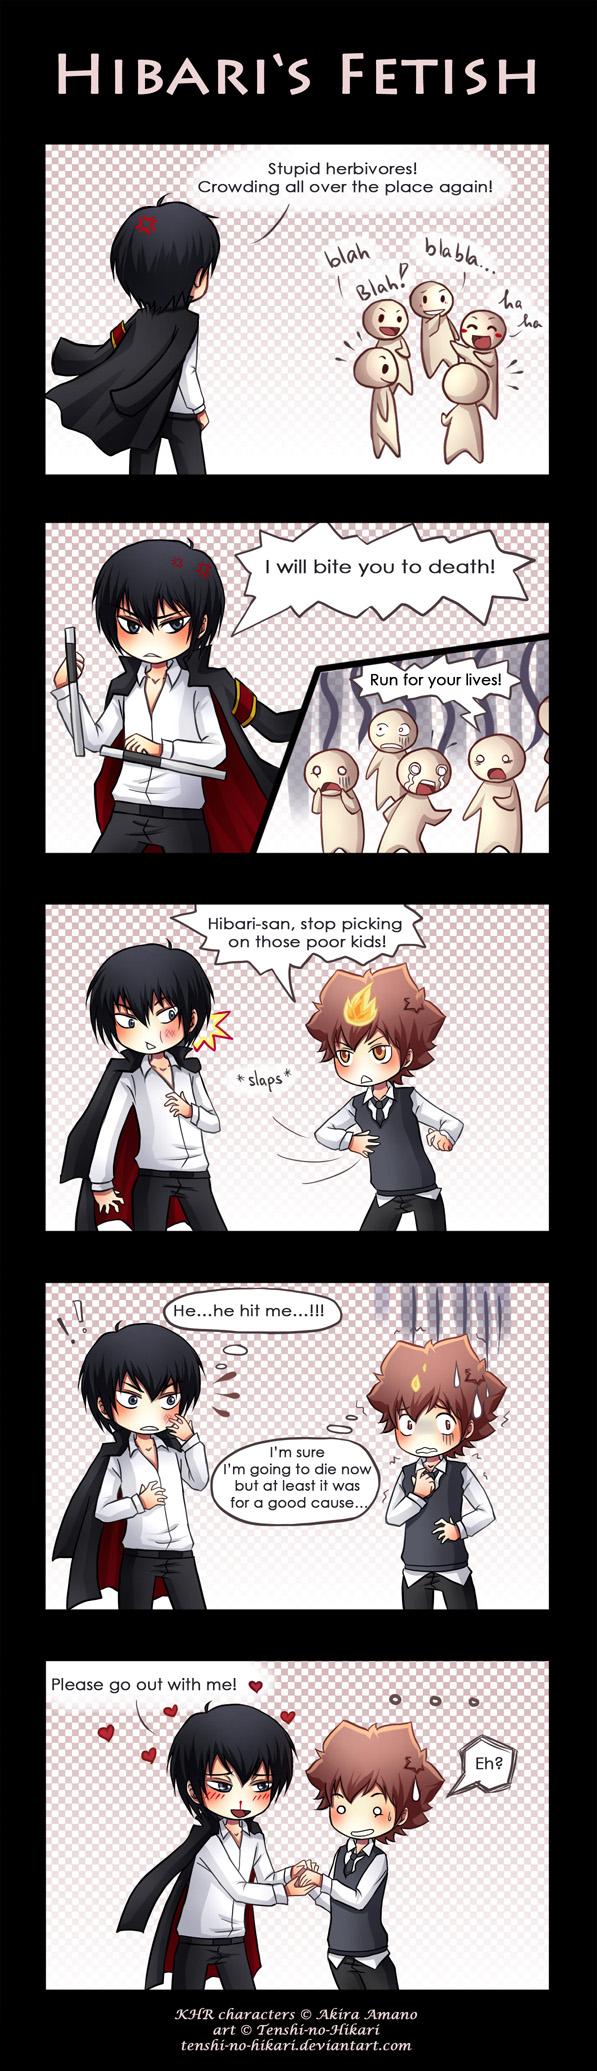 KHR - Hibari's fetish by Tenshi-no-Hikari